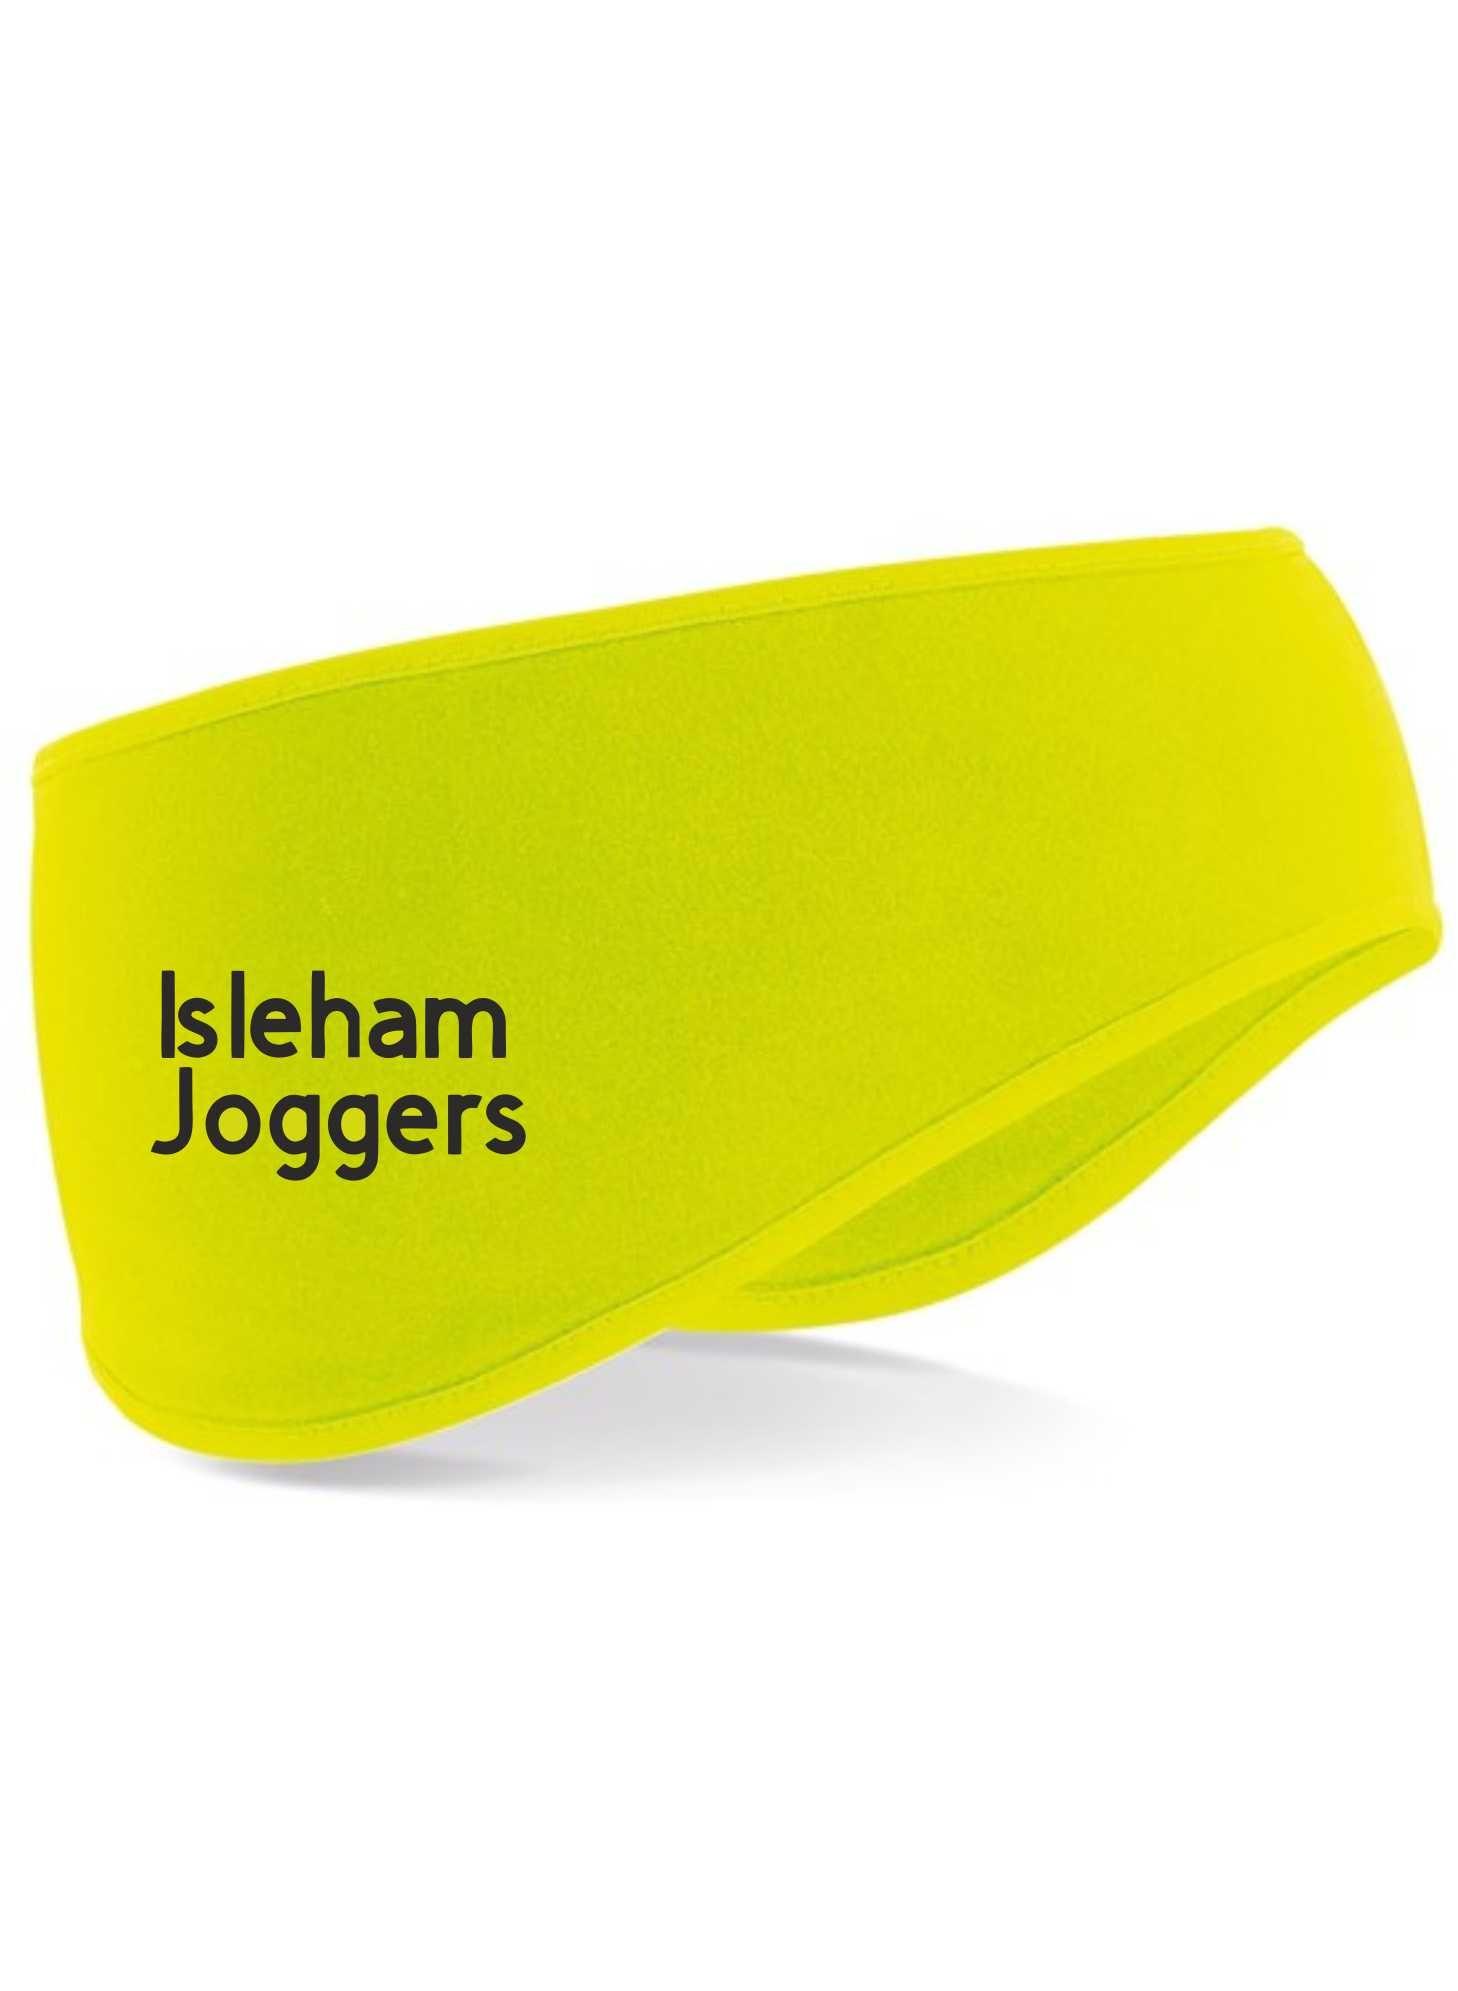 Isleham Joggers- Sports Tech Headband